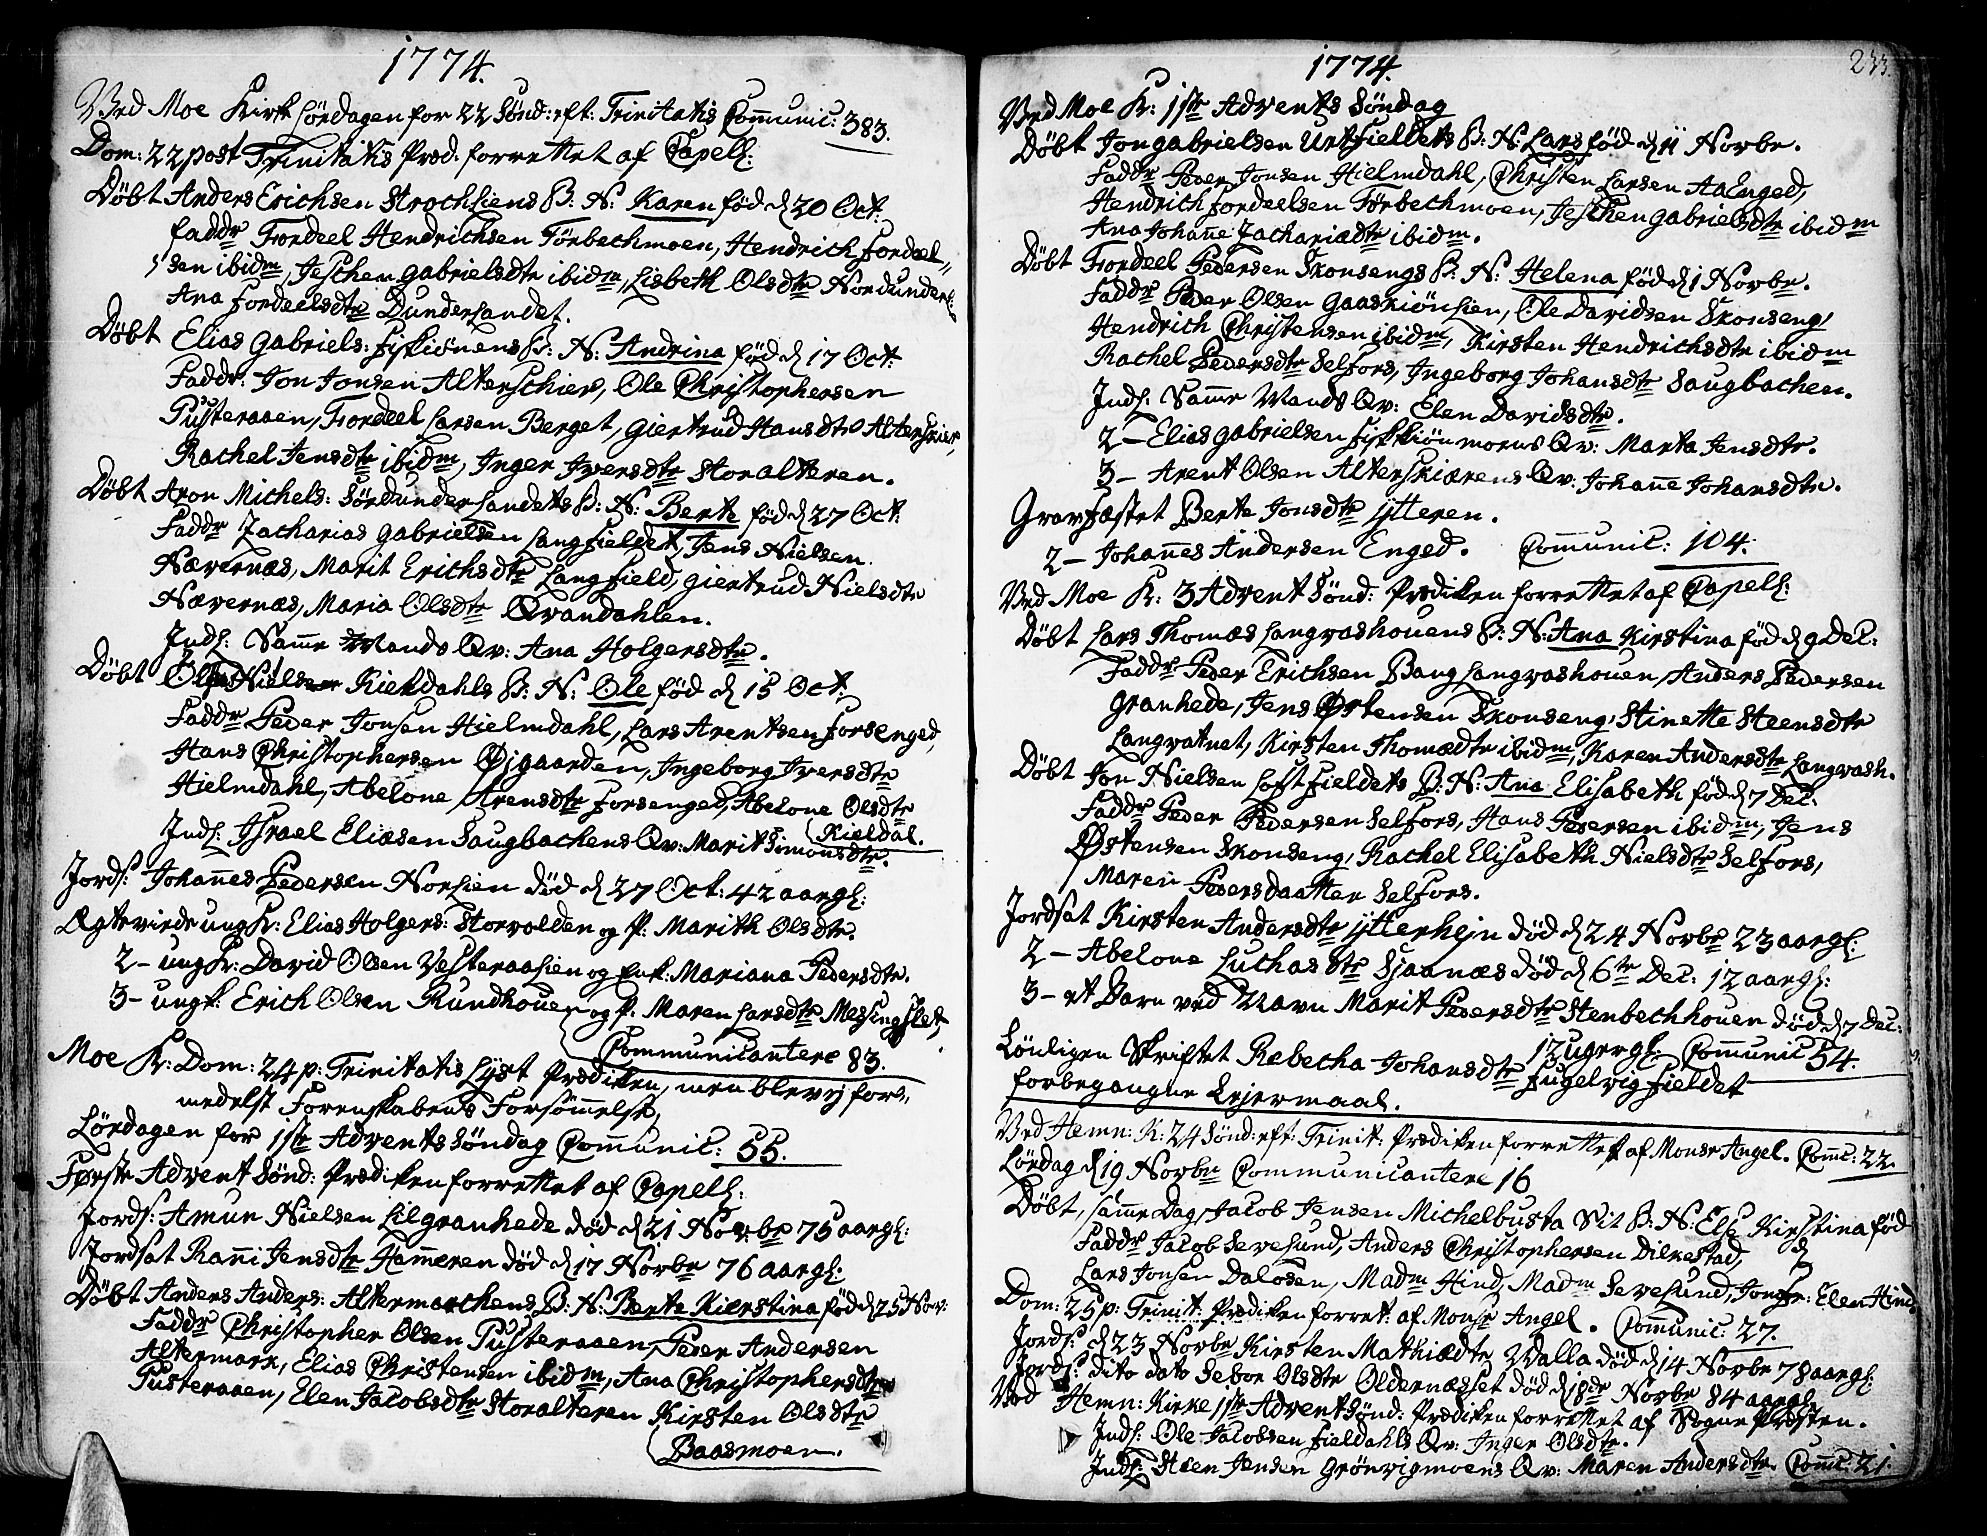 SAT, Ministerialprotokoller, klokkerbøker og fødselsregistre - Nordland, 825/L0348: Ministerialbok nr. 825A04, 1752-1788, s. 233